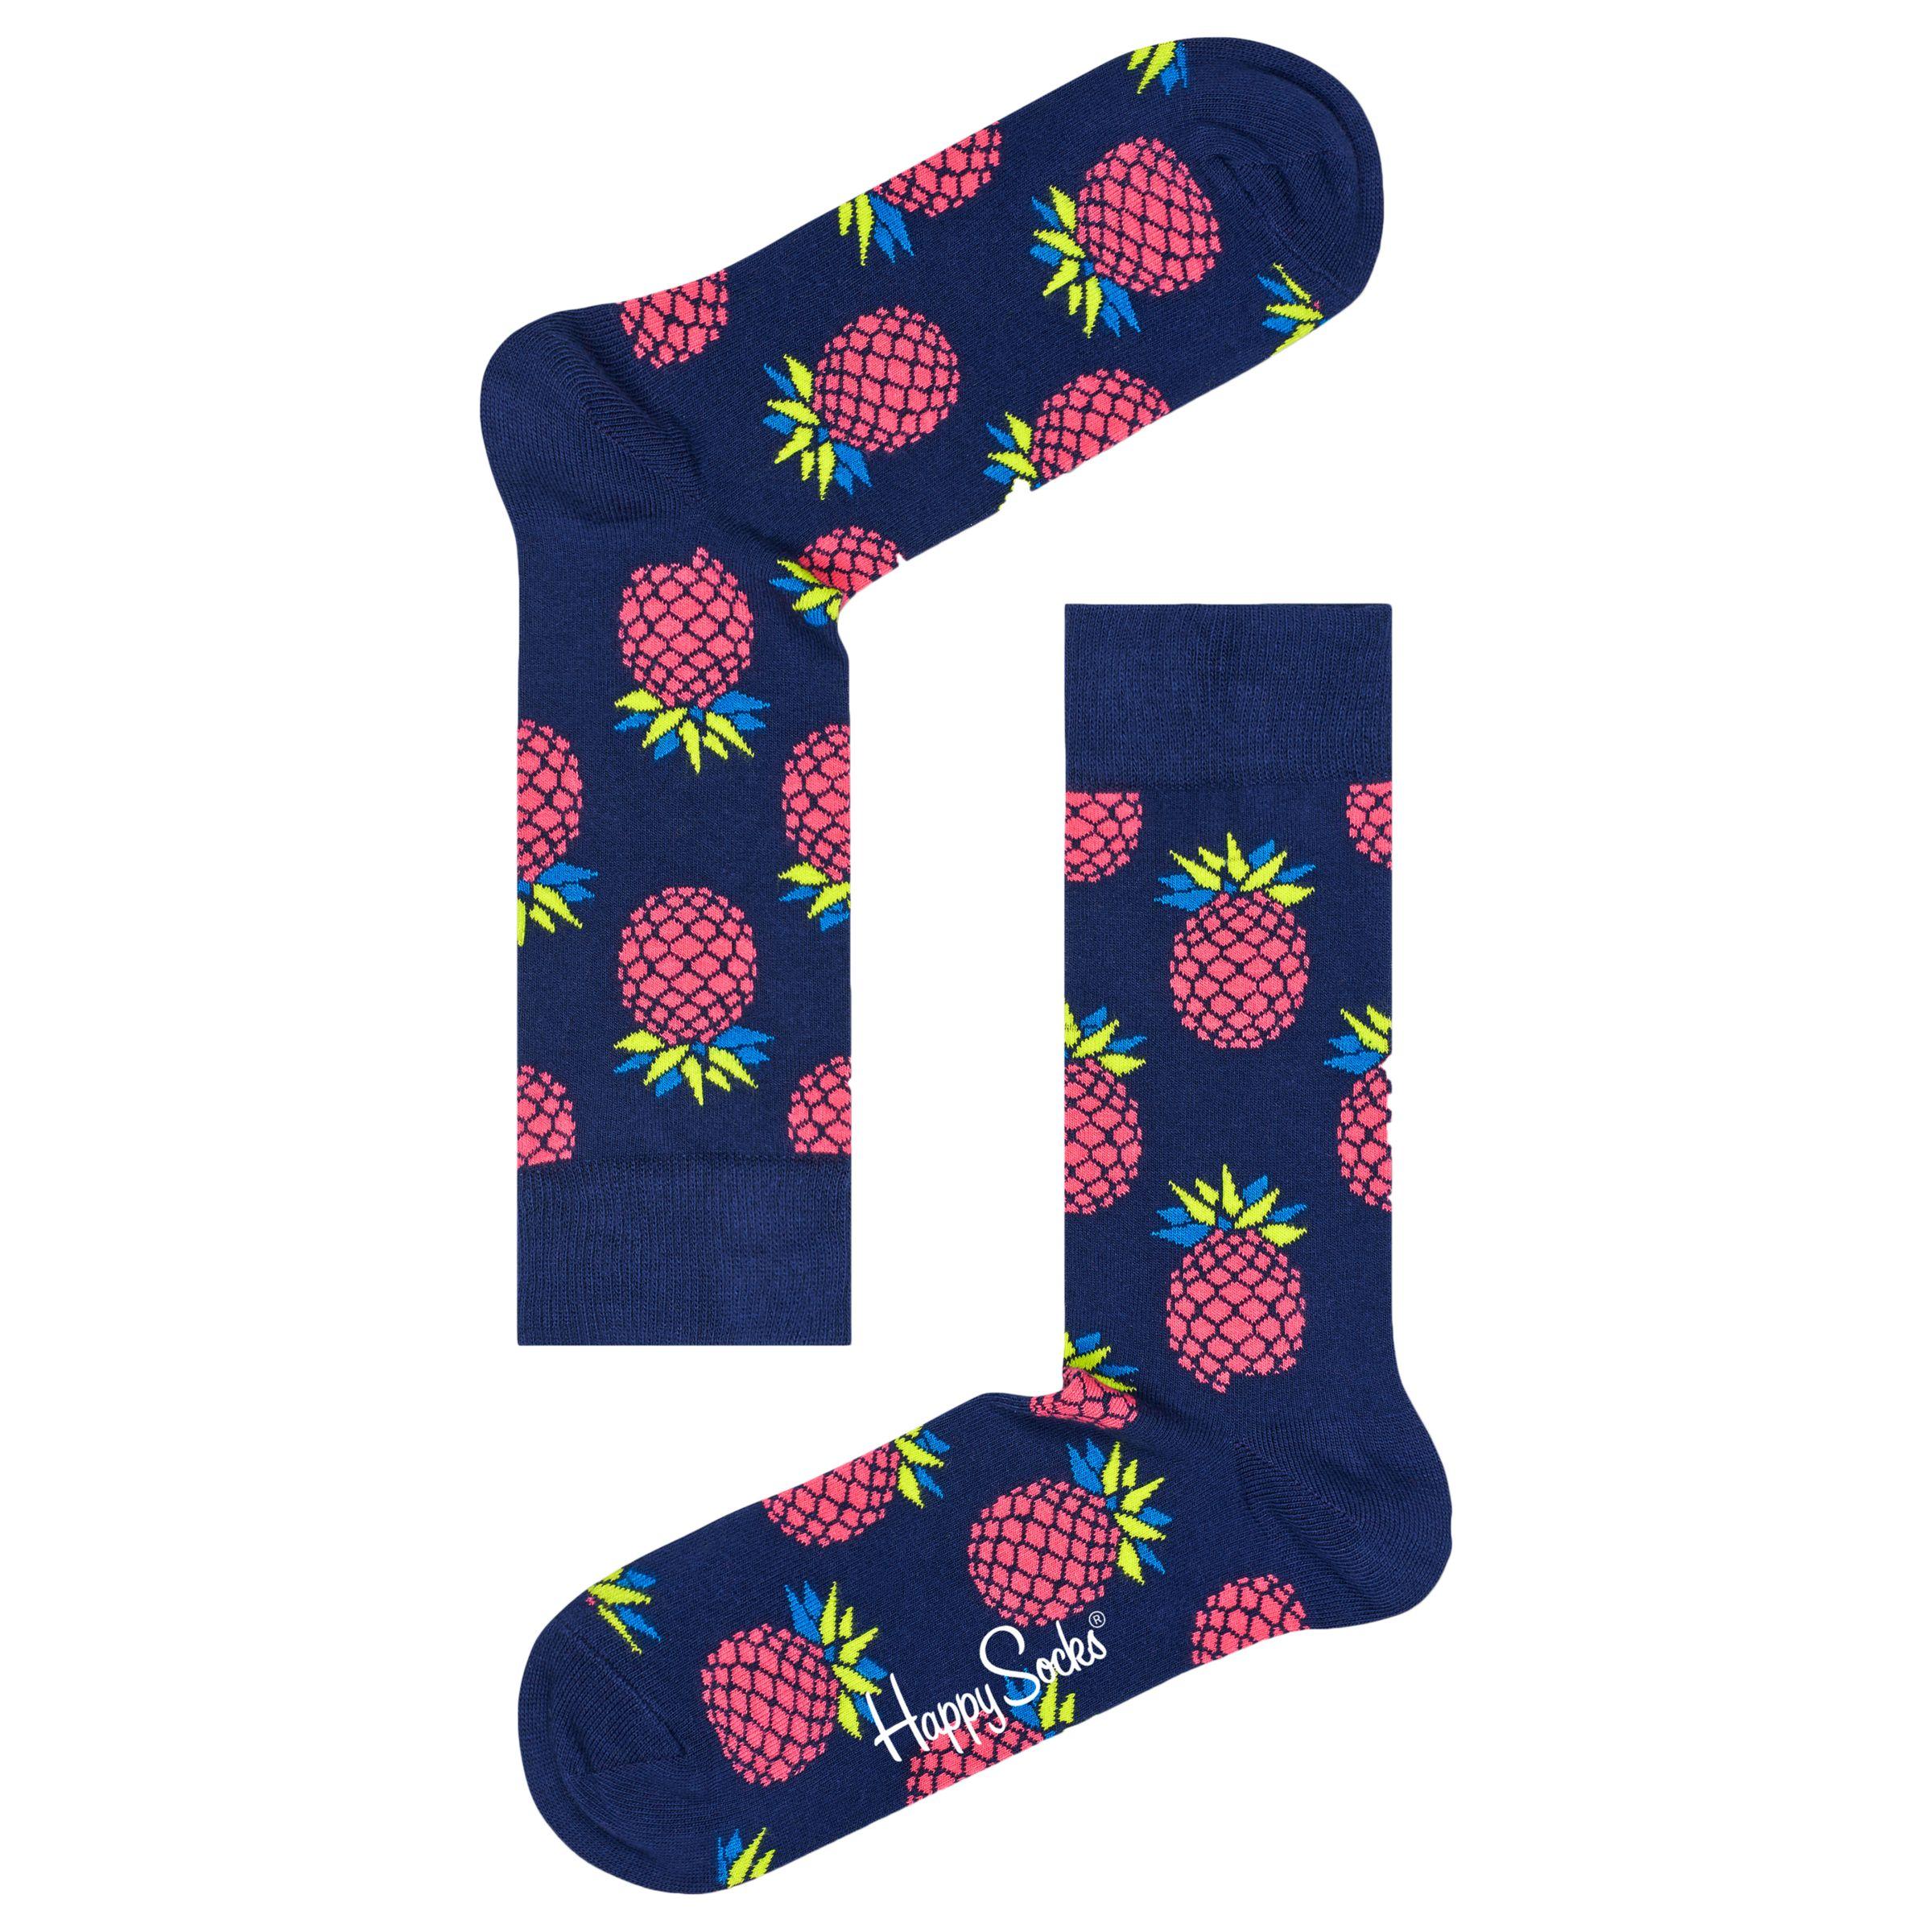 Happy Socks Happy Socks Pineapple Socks, One Size, Navy